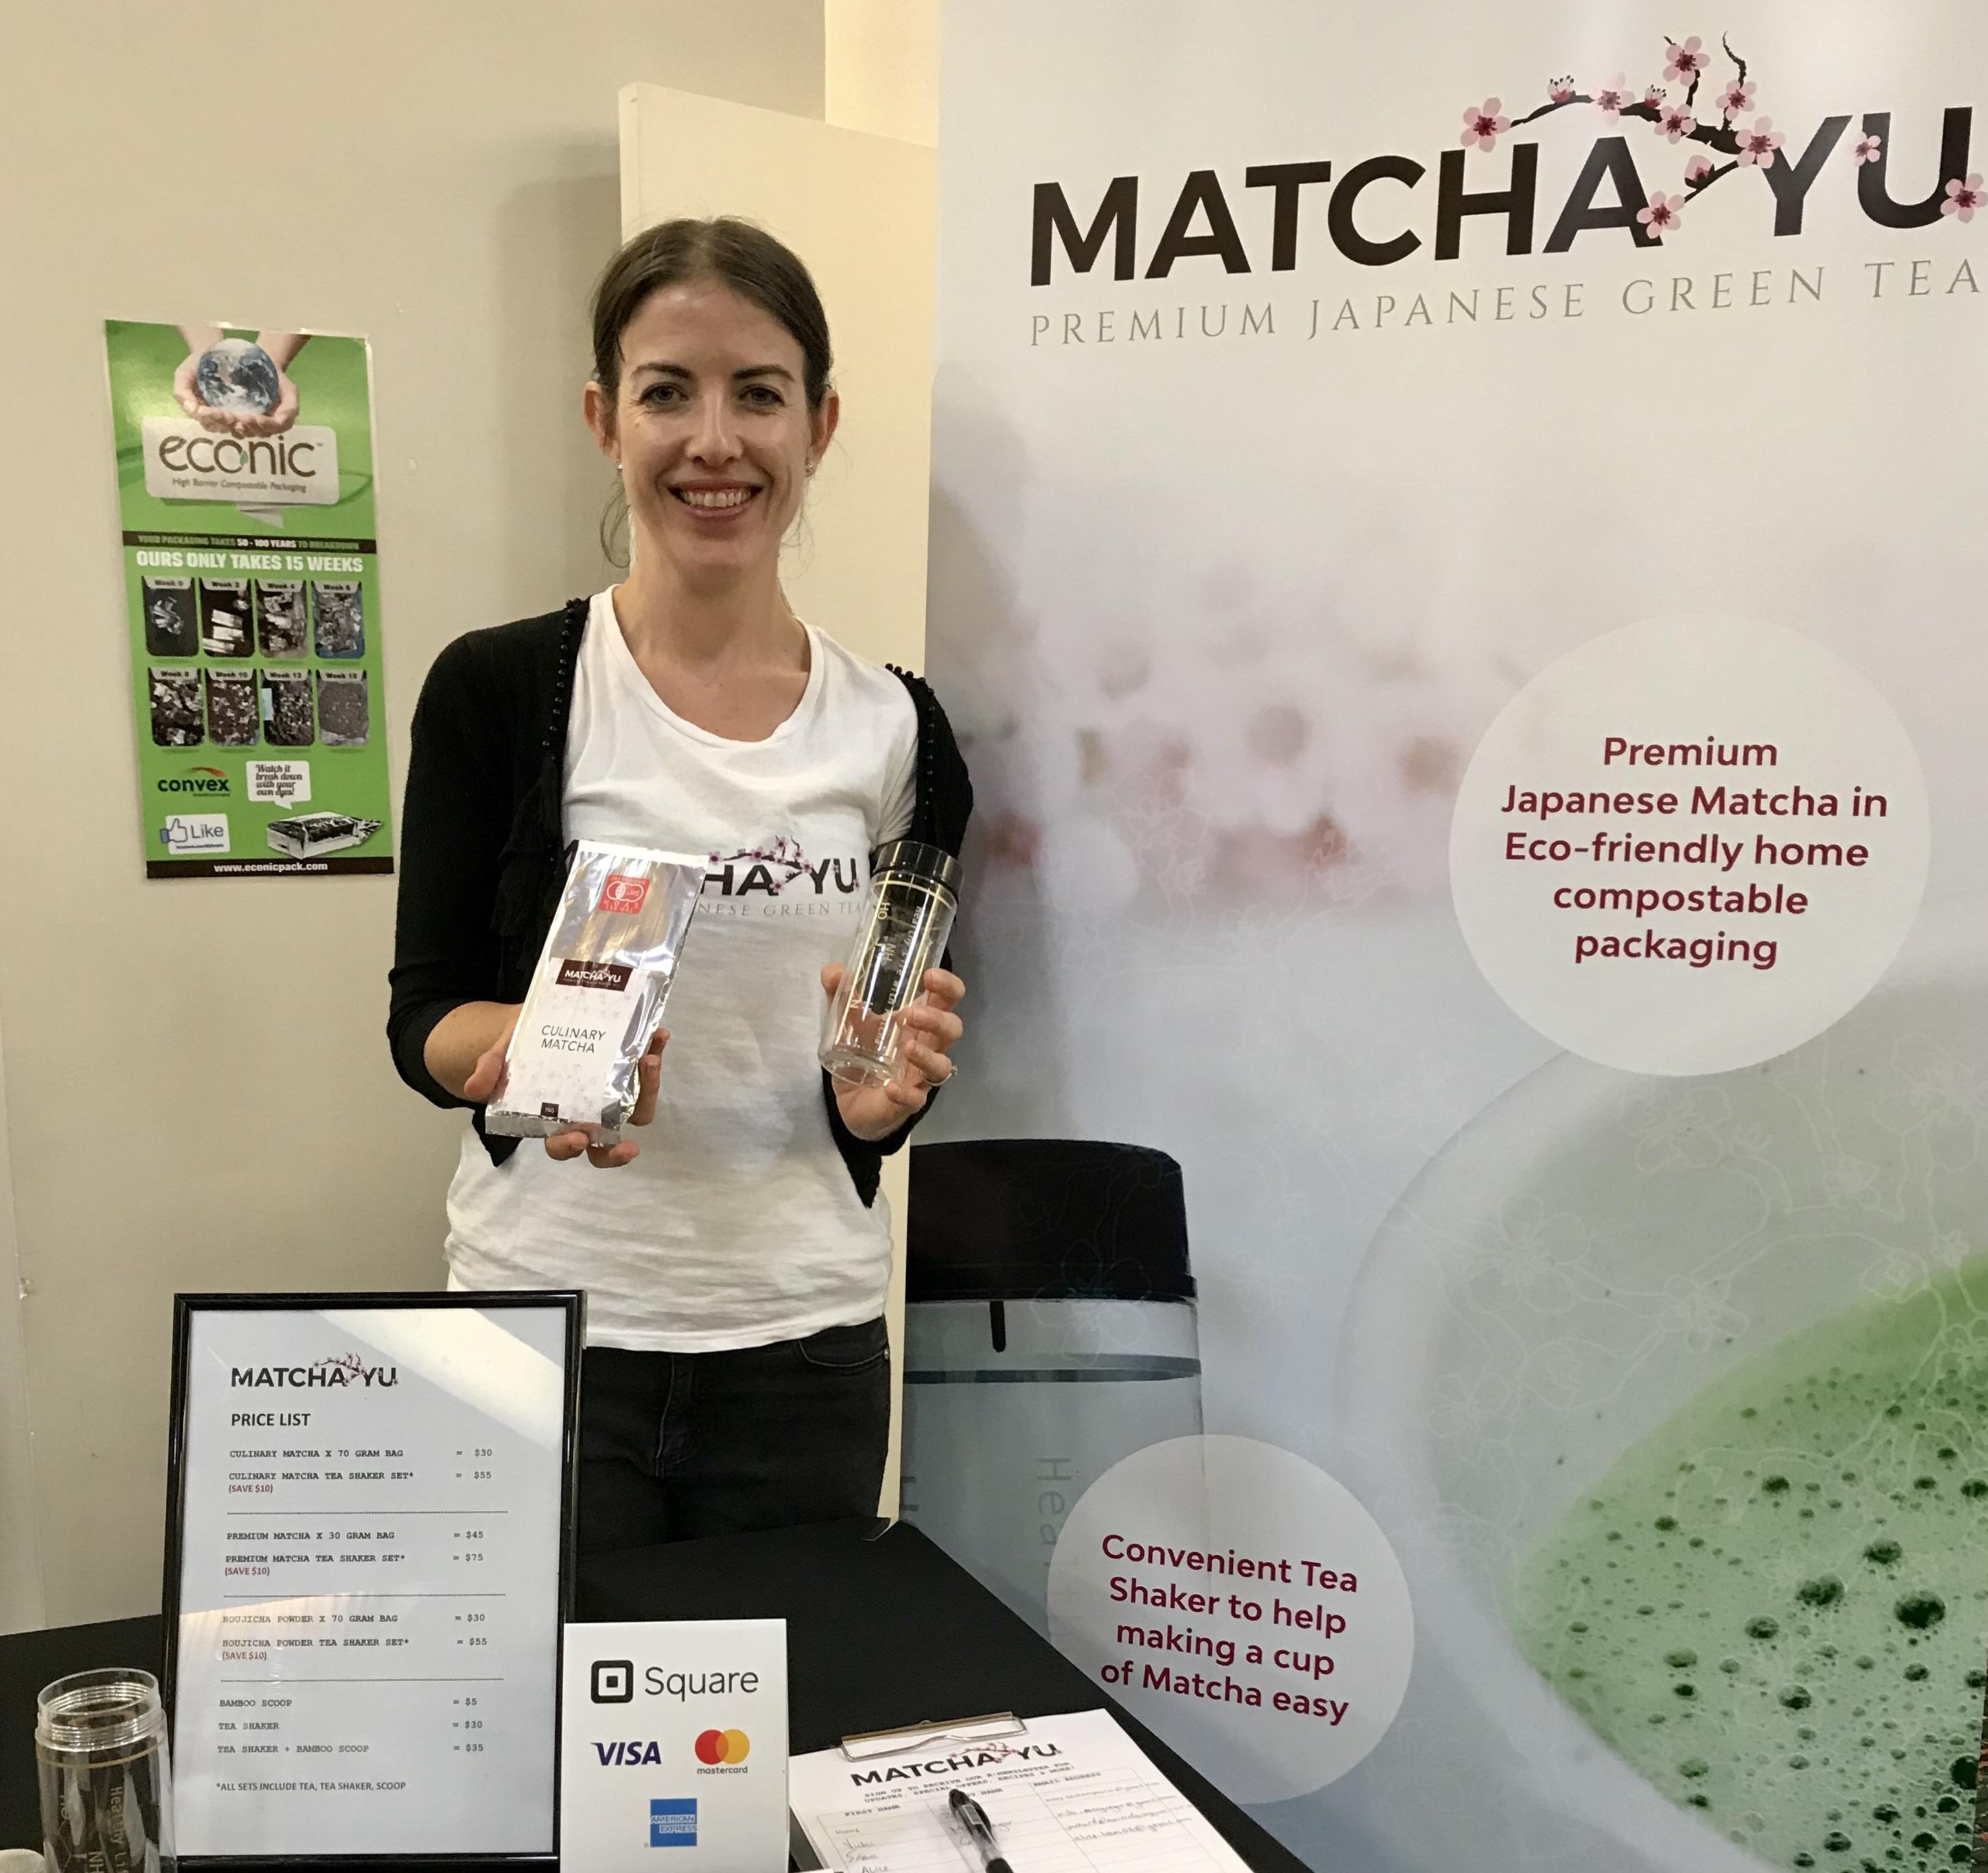 Matcha Yu owner, Erin Lindwall.